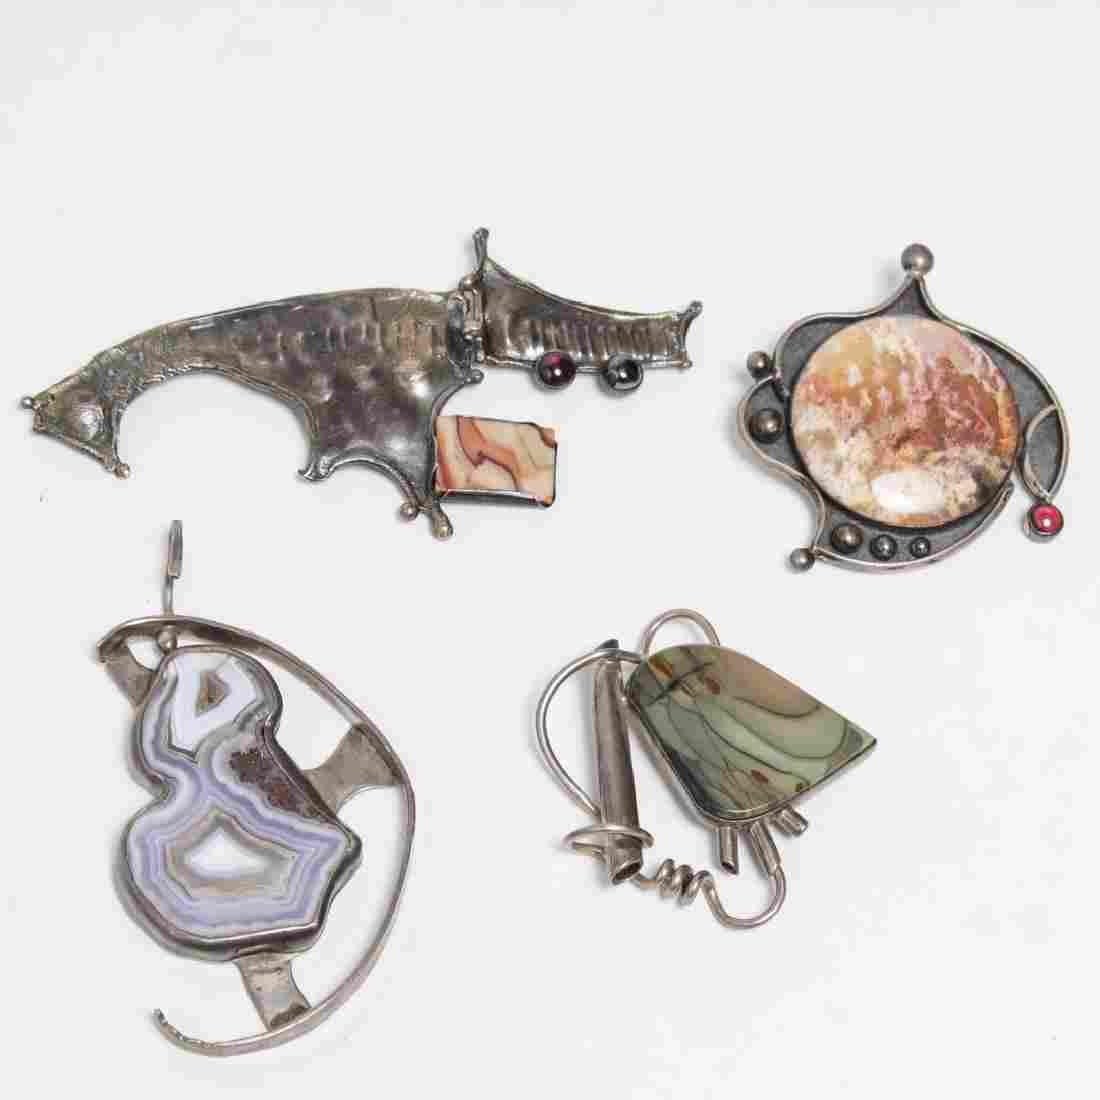 Modernist Silver & Jasper or Quartz-Set Jewlery, 4